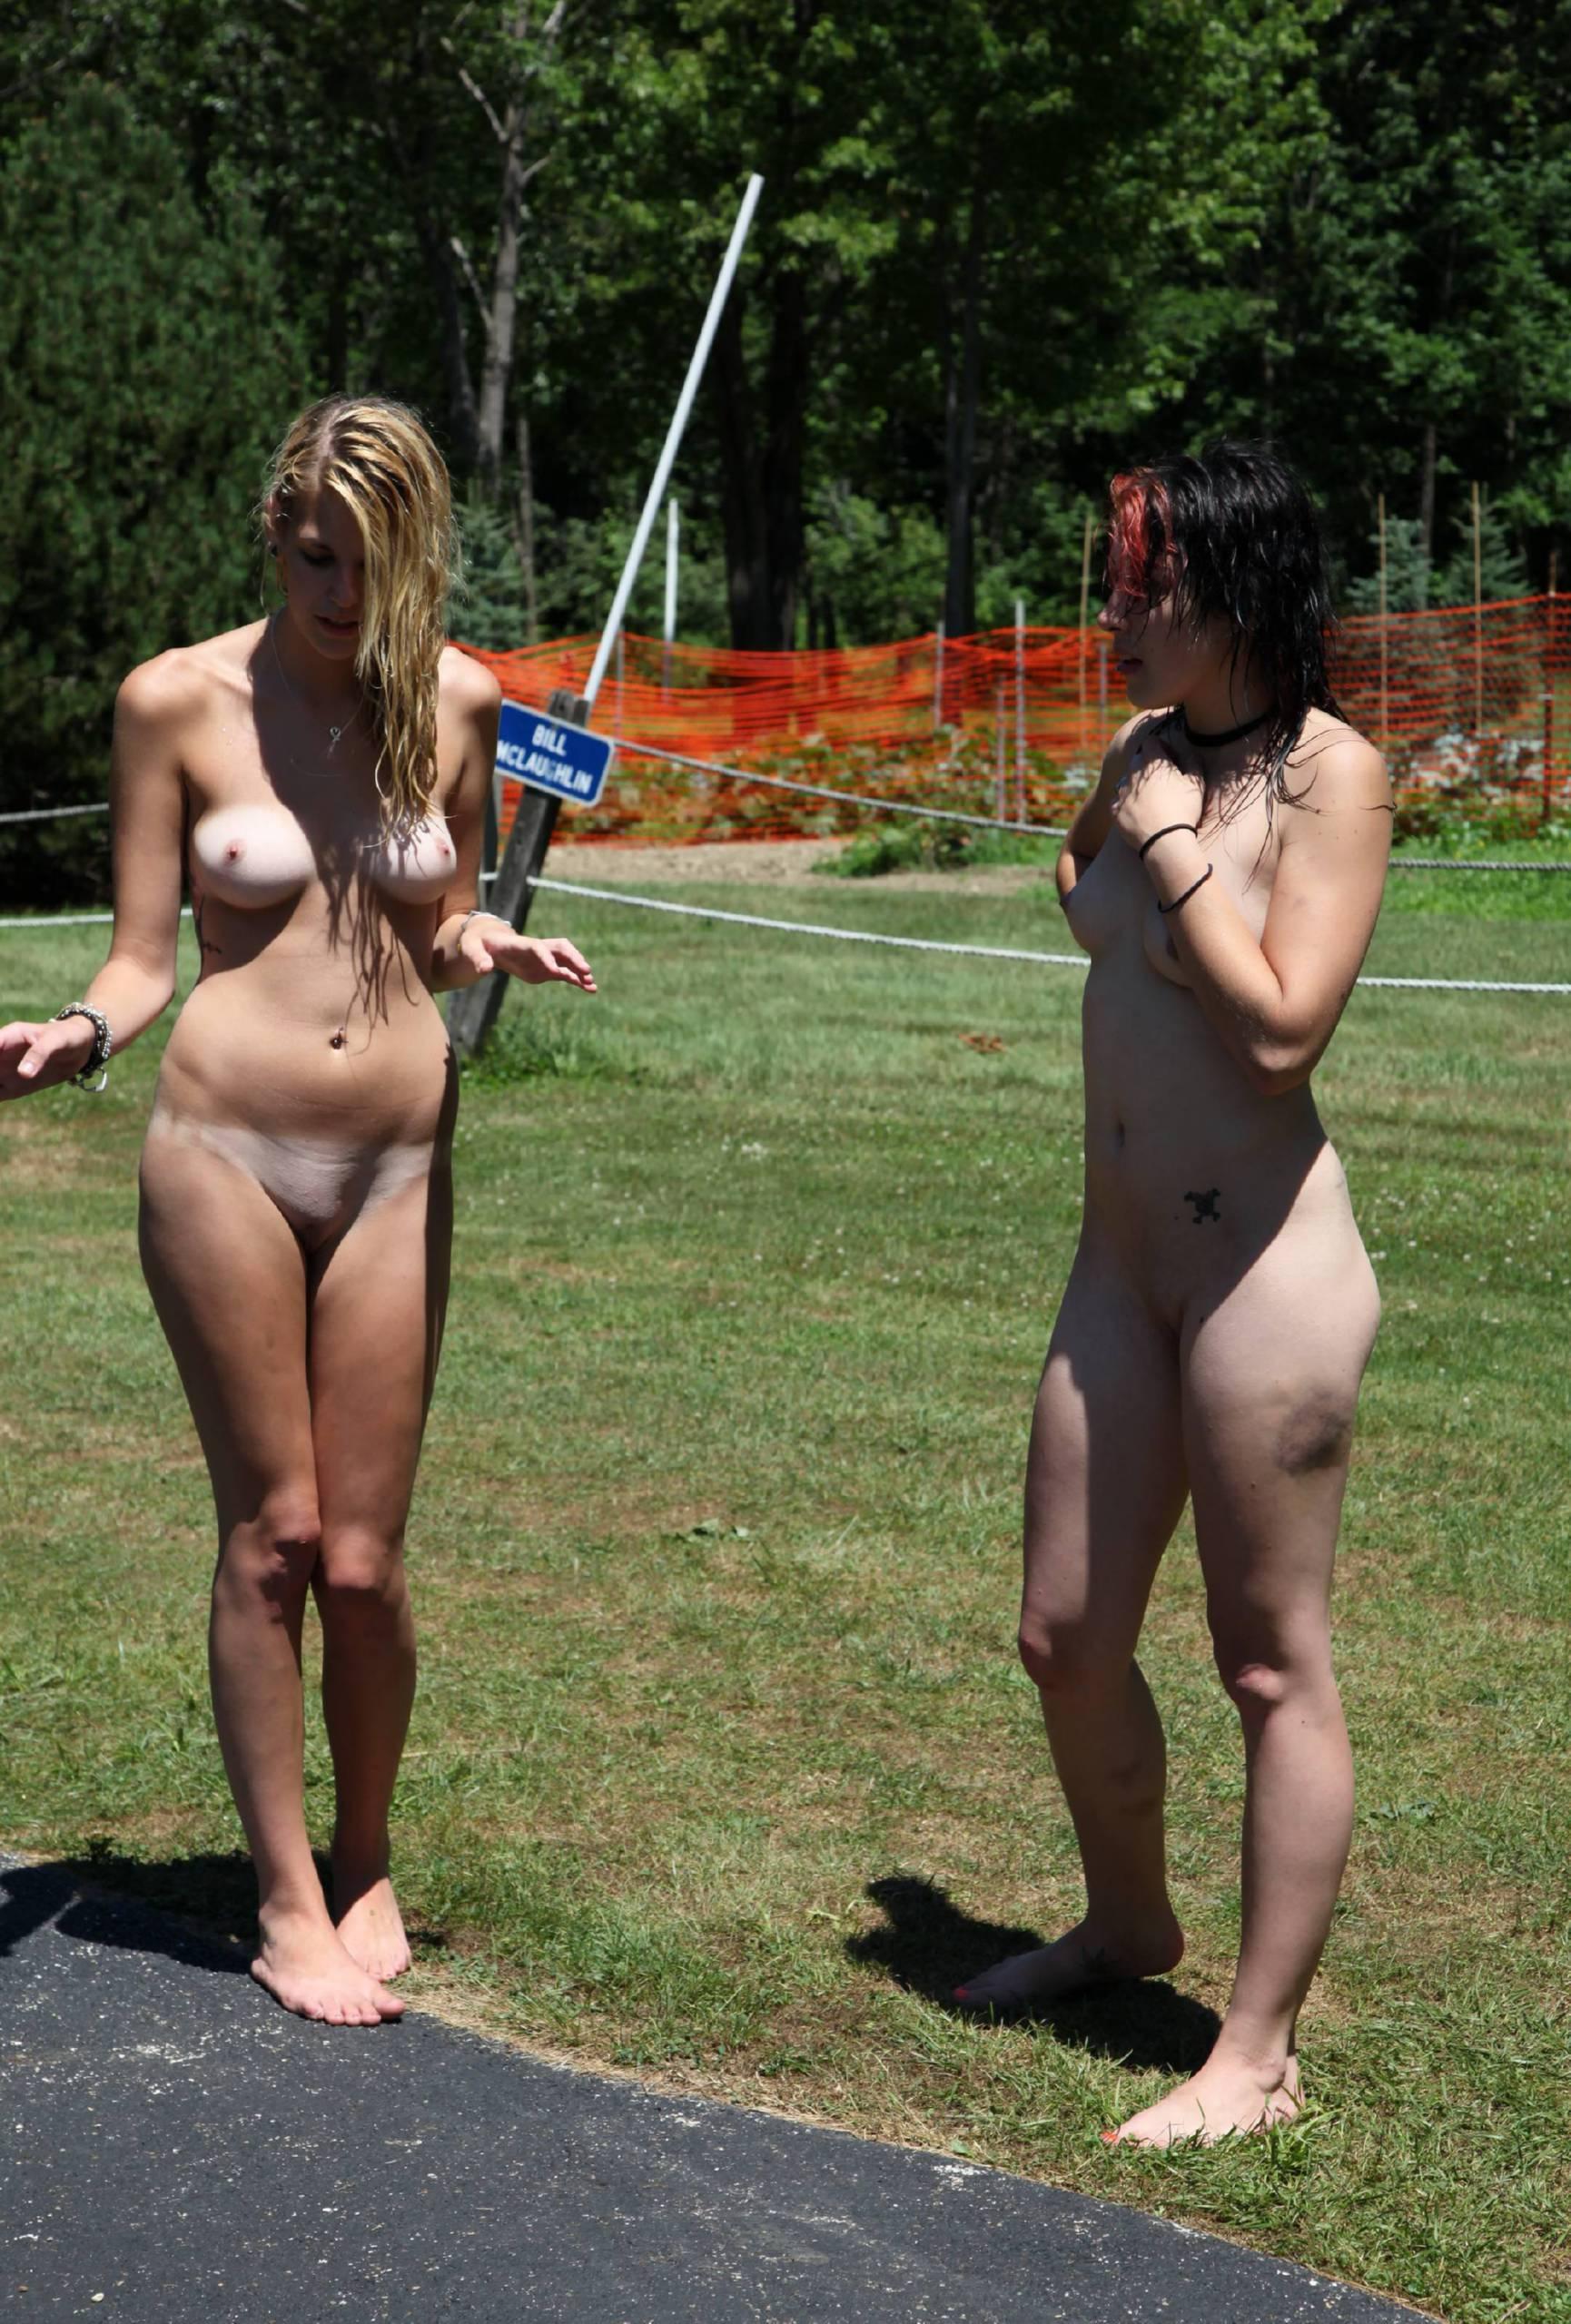 Nudist Pics Grassy Green Delights - 1